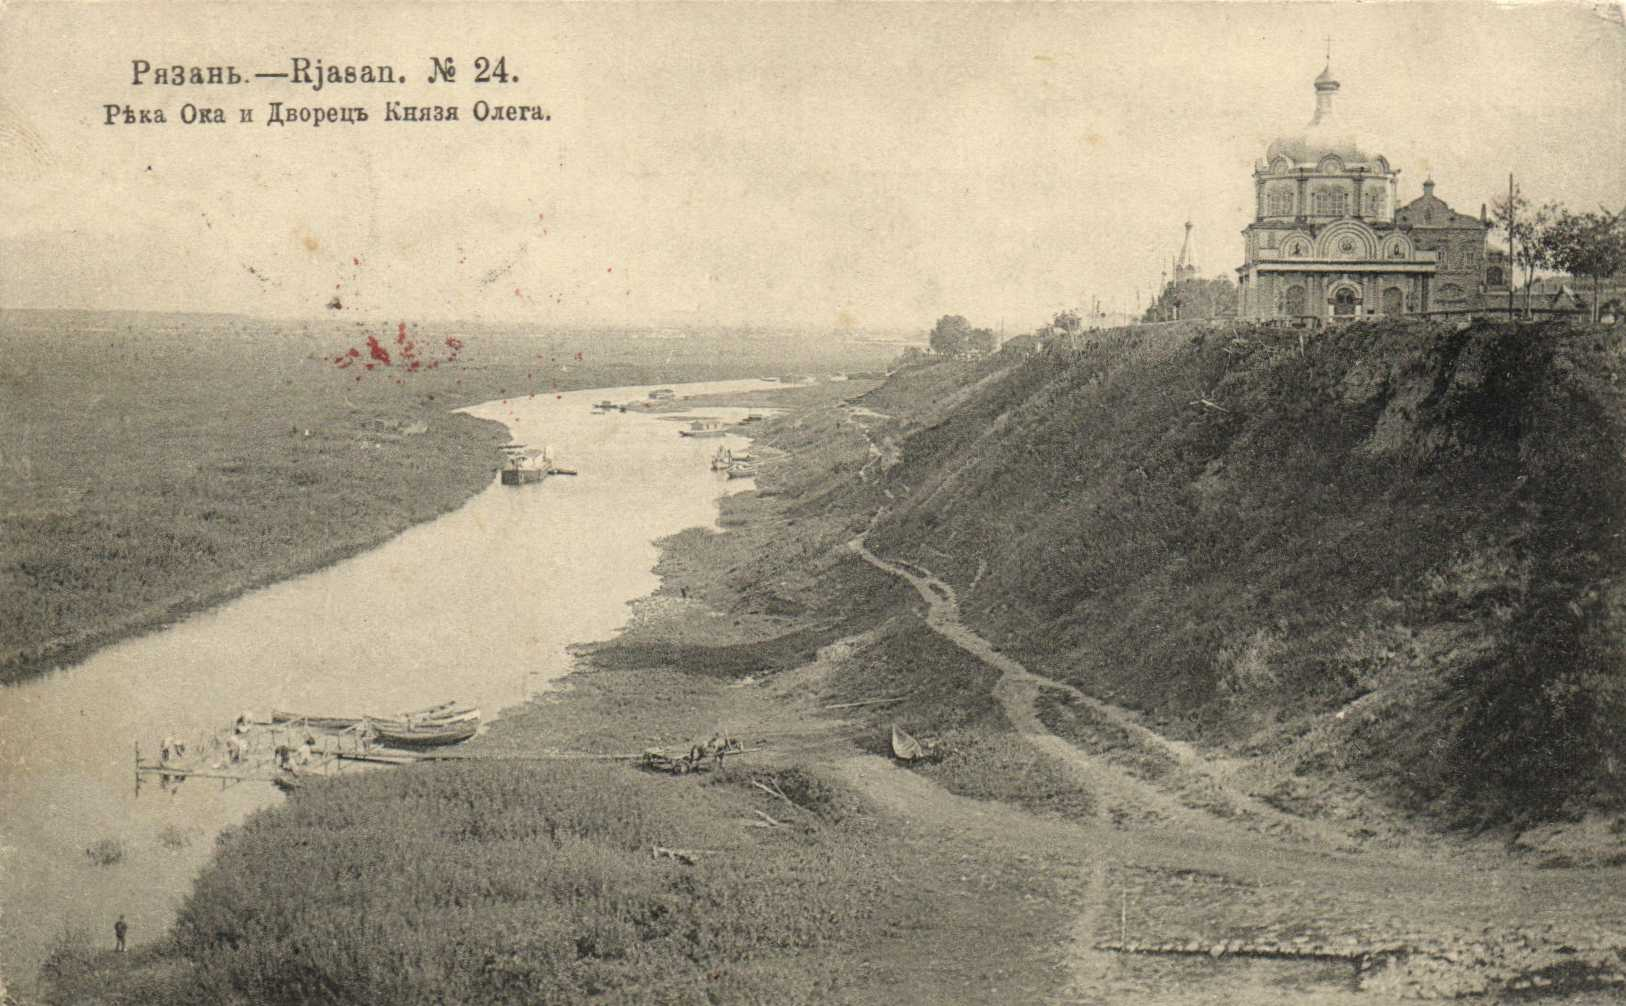 Река Ока и дворец князя Олега